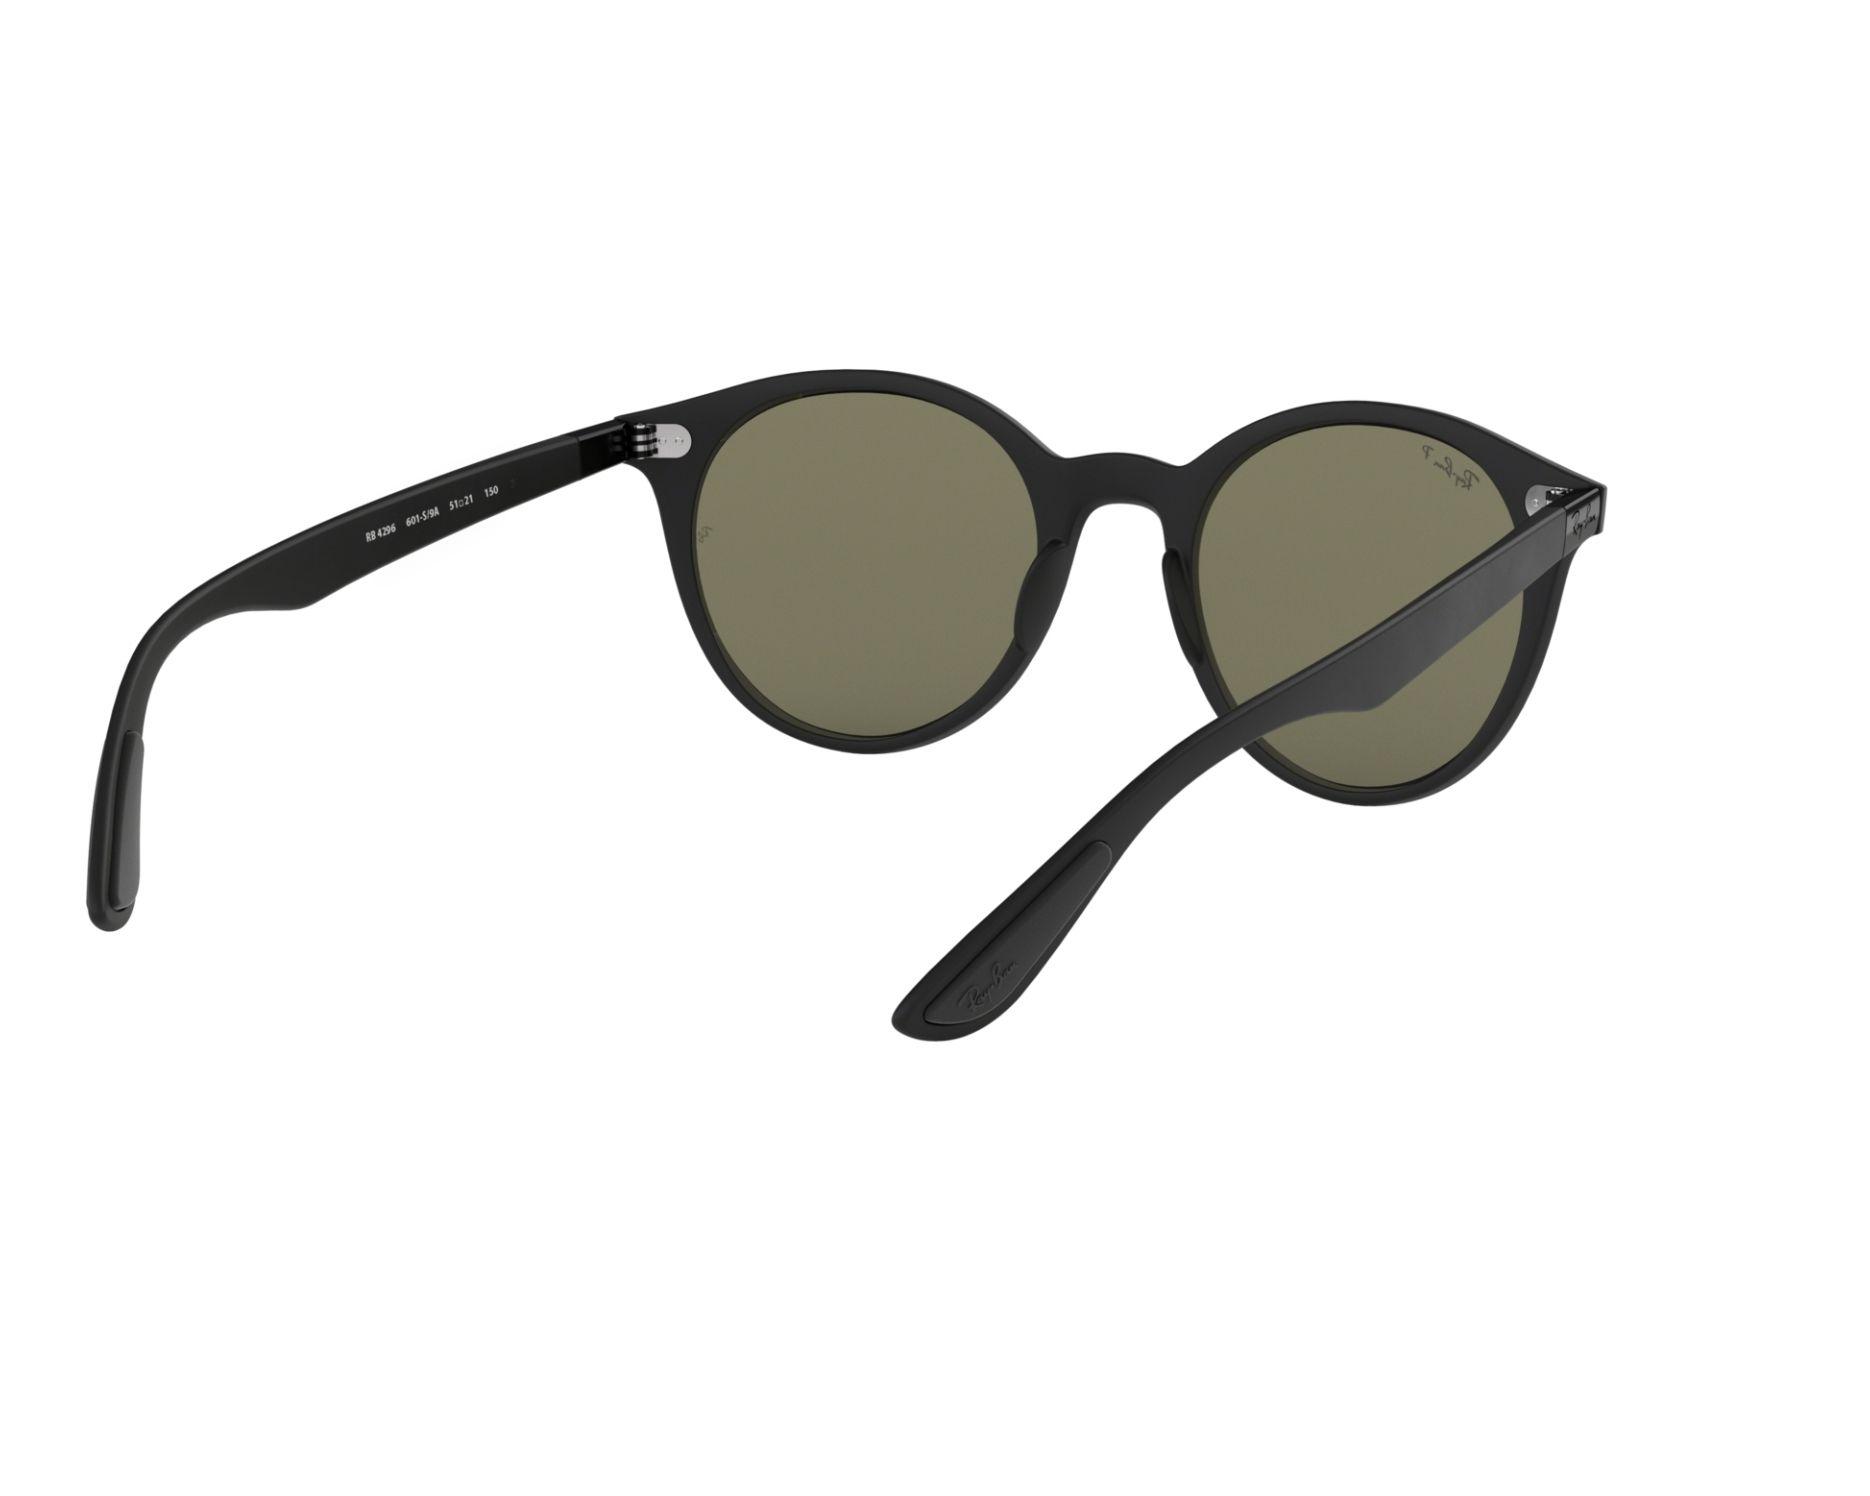 RAY BAN RAY-BAN Sonnenbrille » RB4296«, schwarz, 601S9A - schwarz/grün